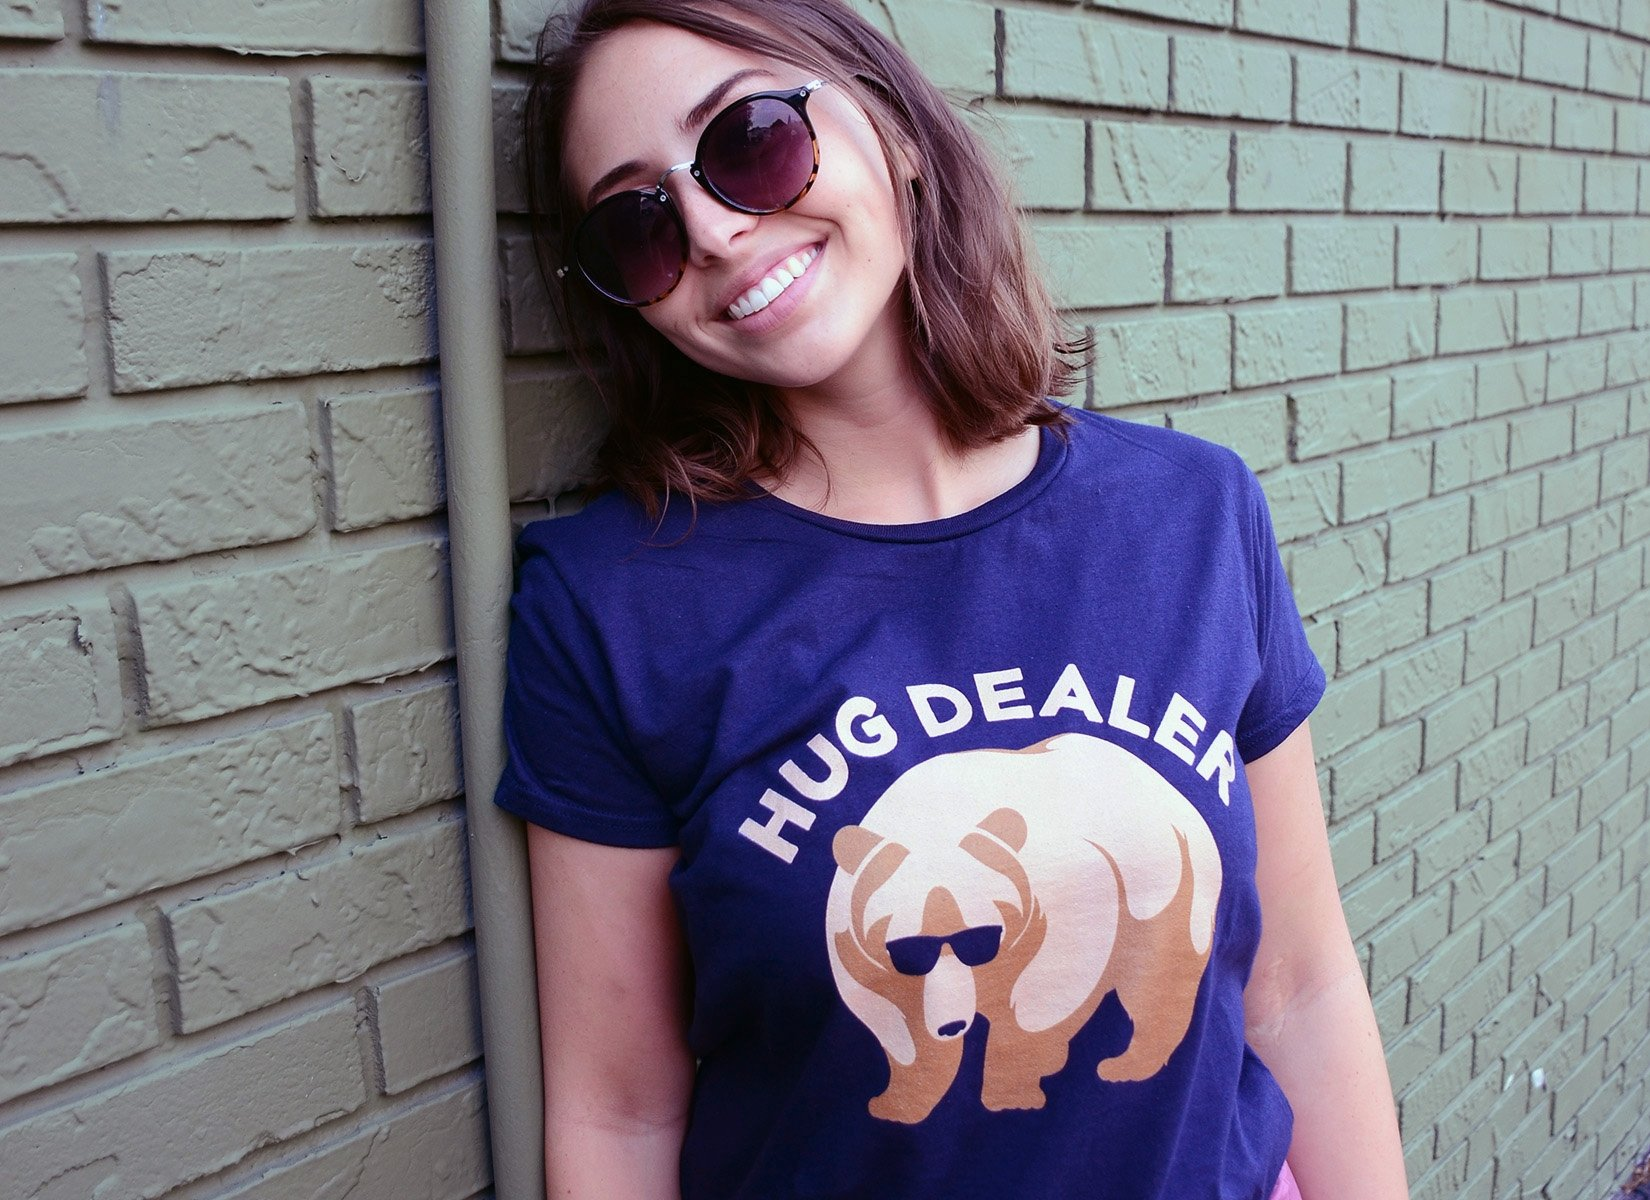 Hug Dealer on Womens T-Shirt